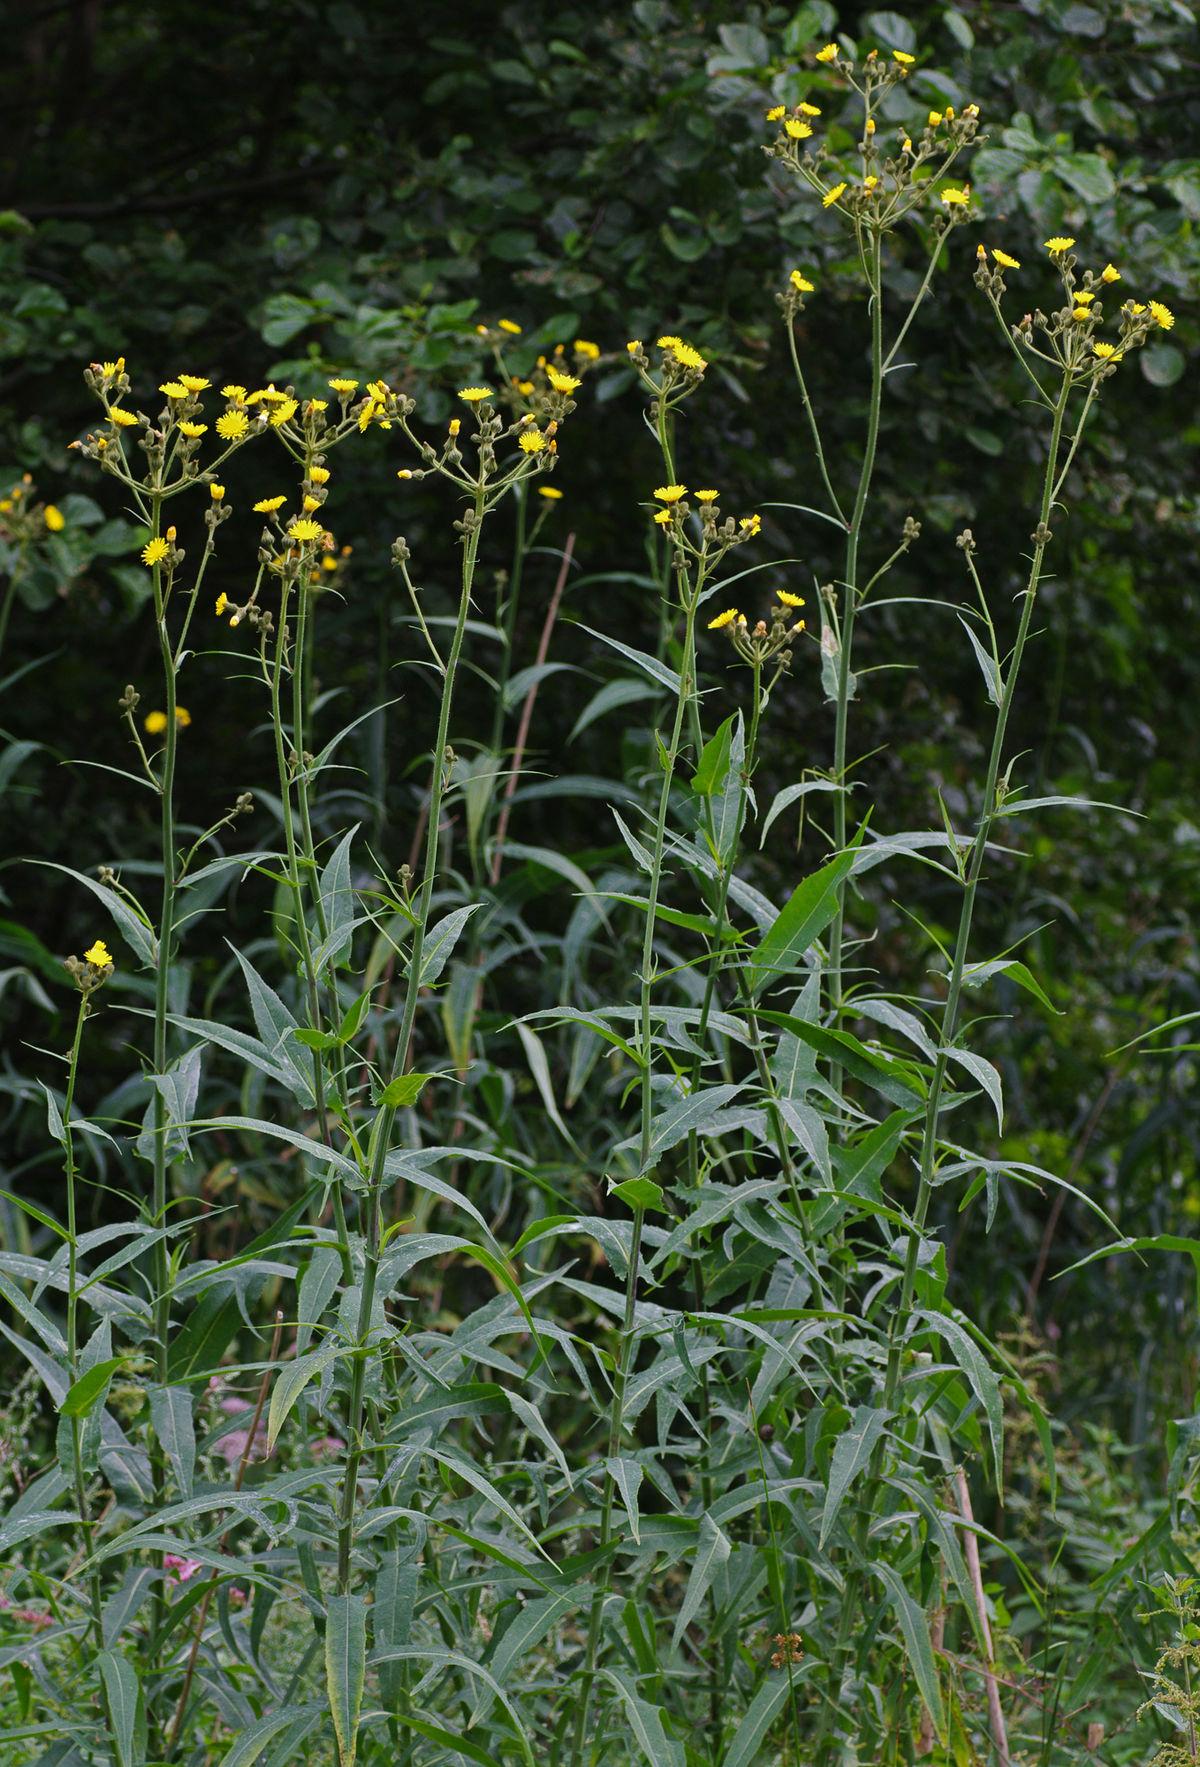 sonchus palustris  u2014 wikip u00e9dia